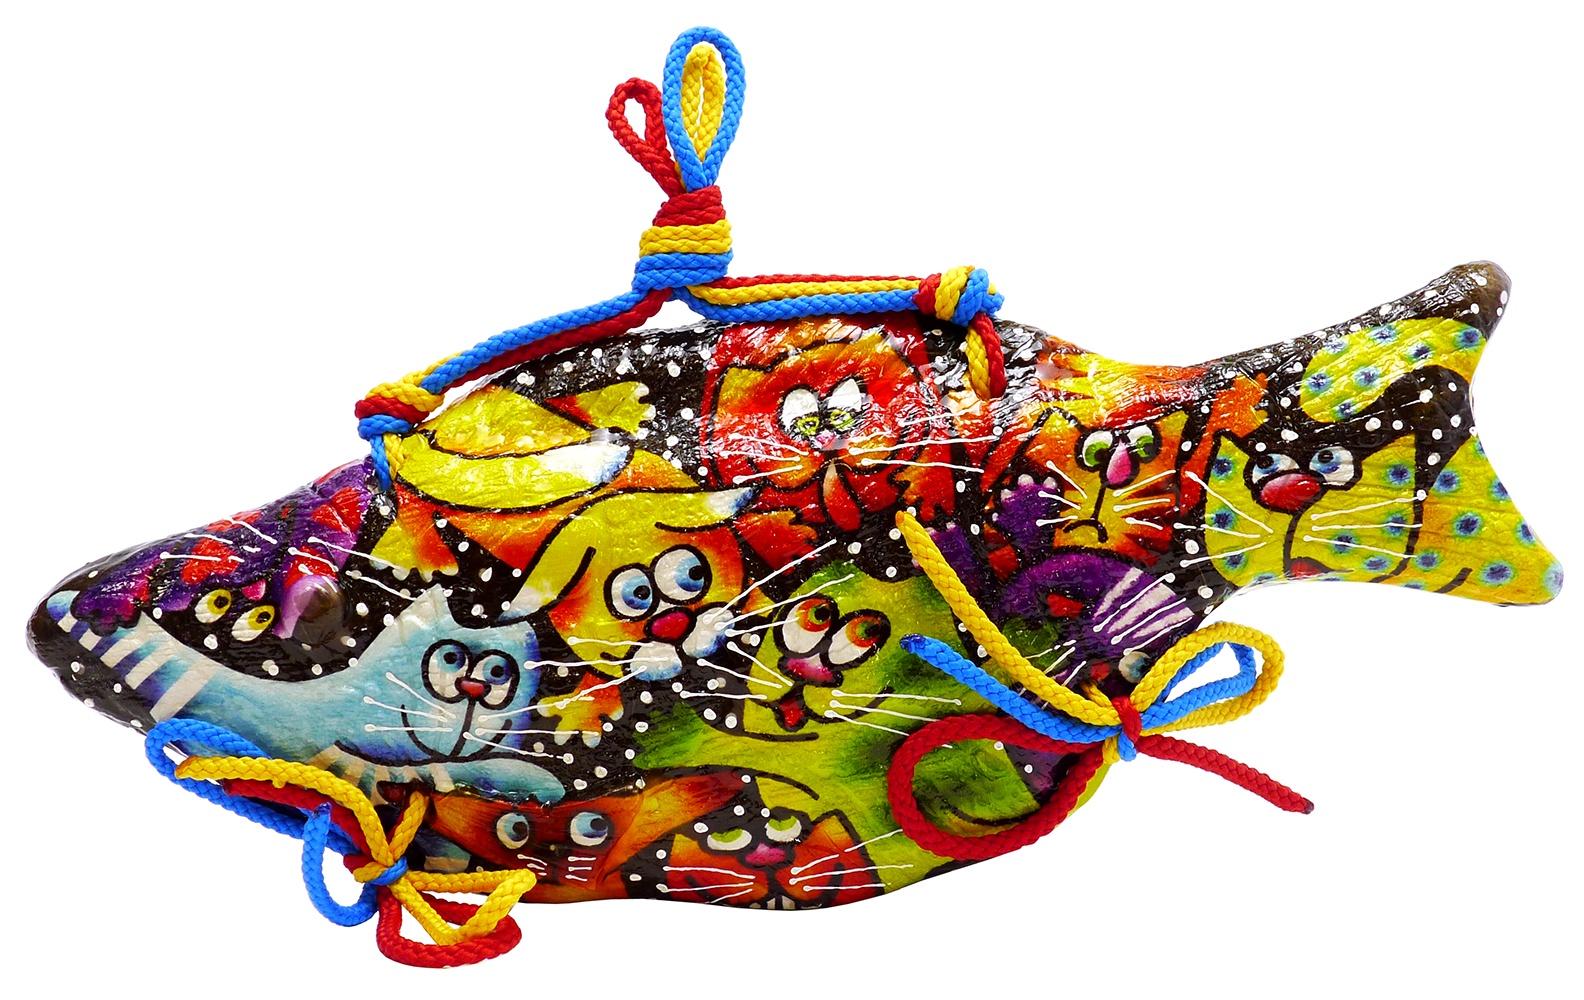 Декоративное панно Мастер Чирва Рыба цепочка (СК-303), голубой